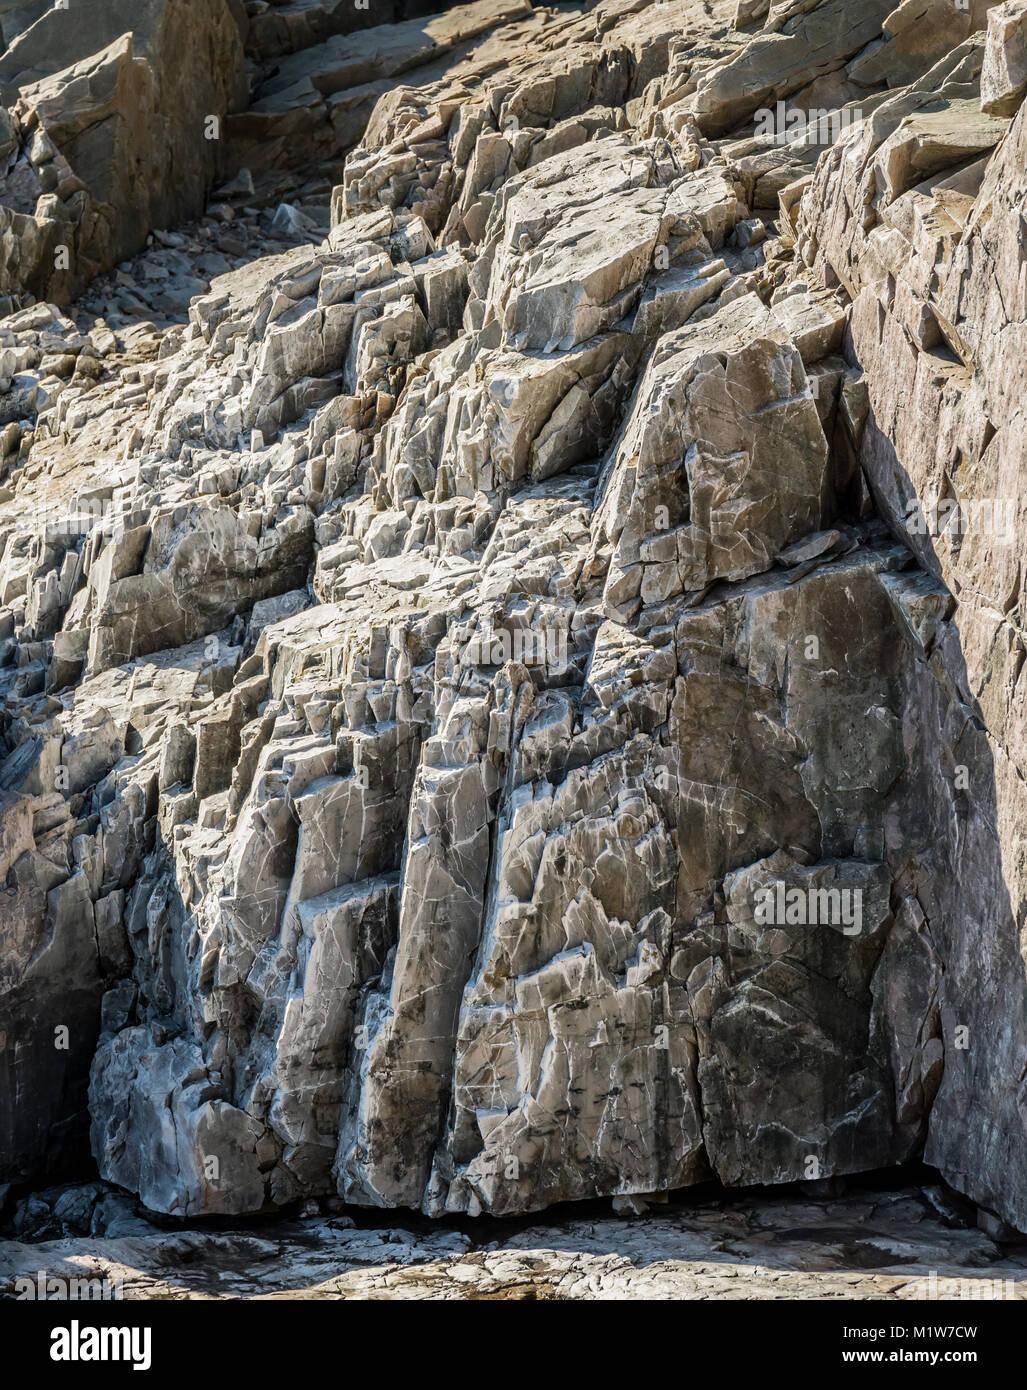 Jagged Rocks on Maine Coast in Acadia National Park - Stock Image